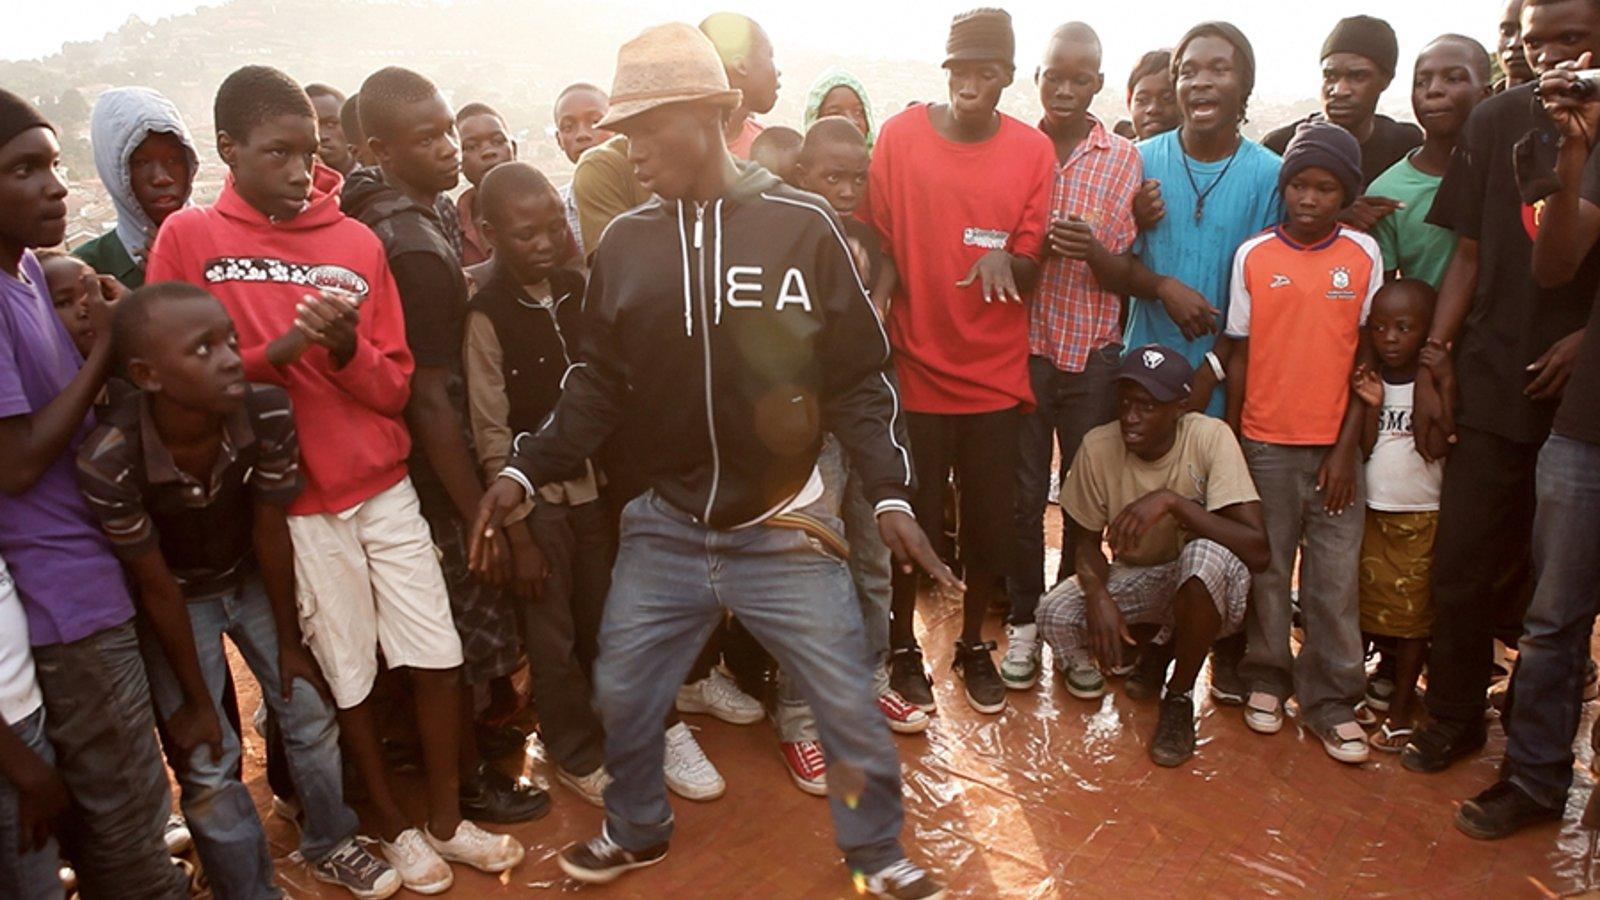 Shake The Dust - Breakdancing Around the World